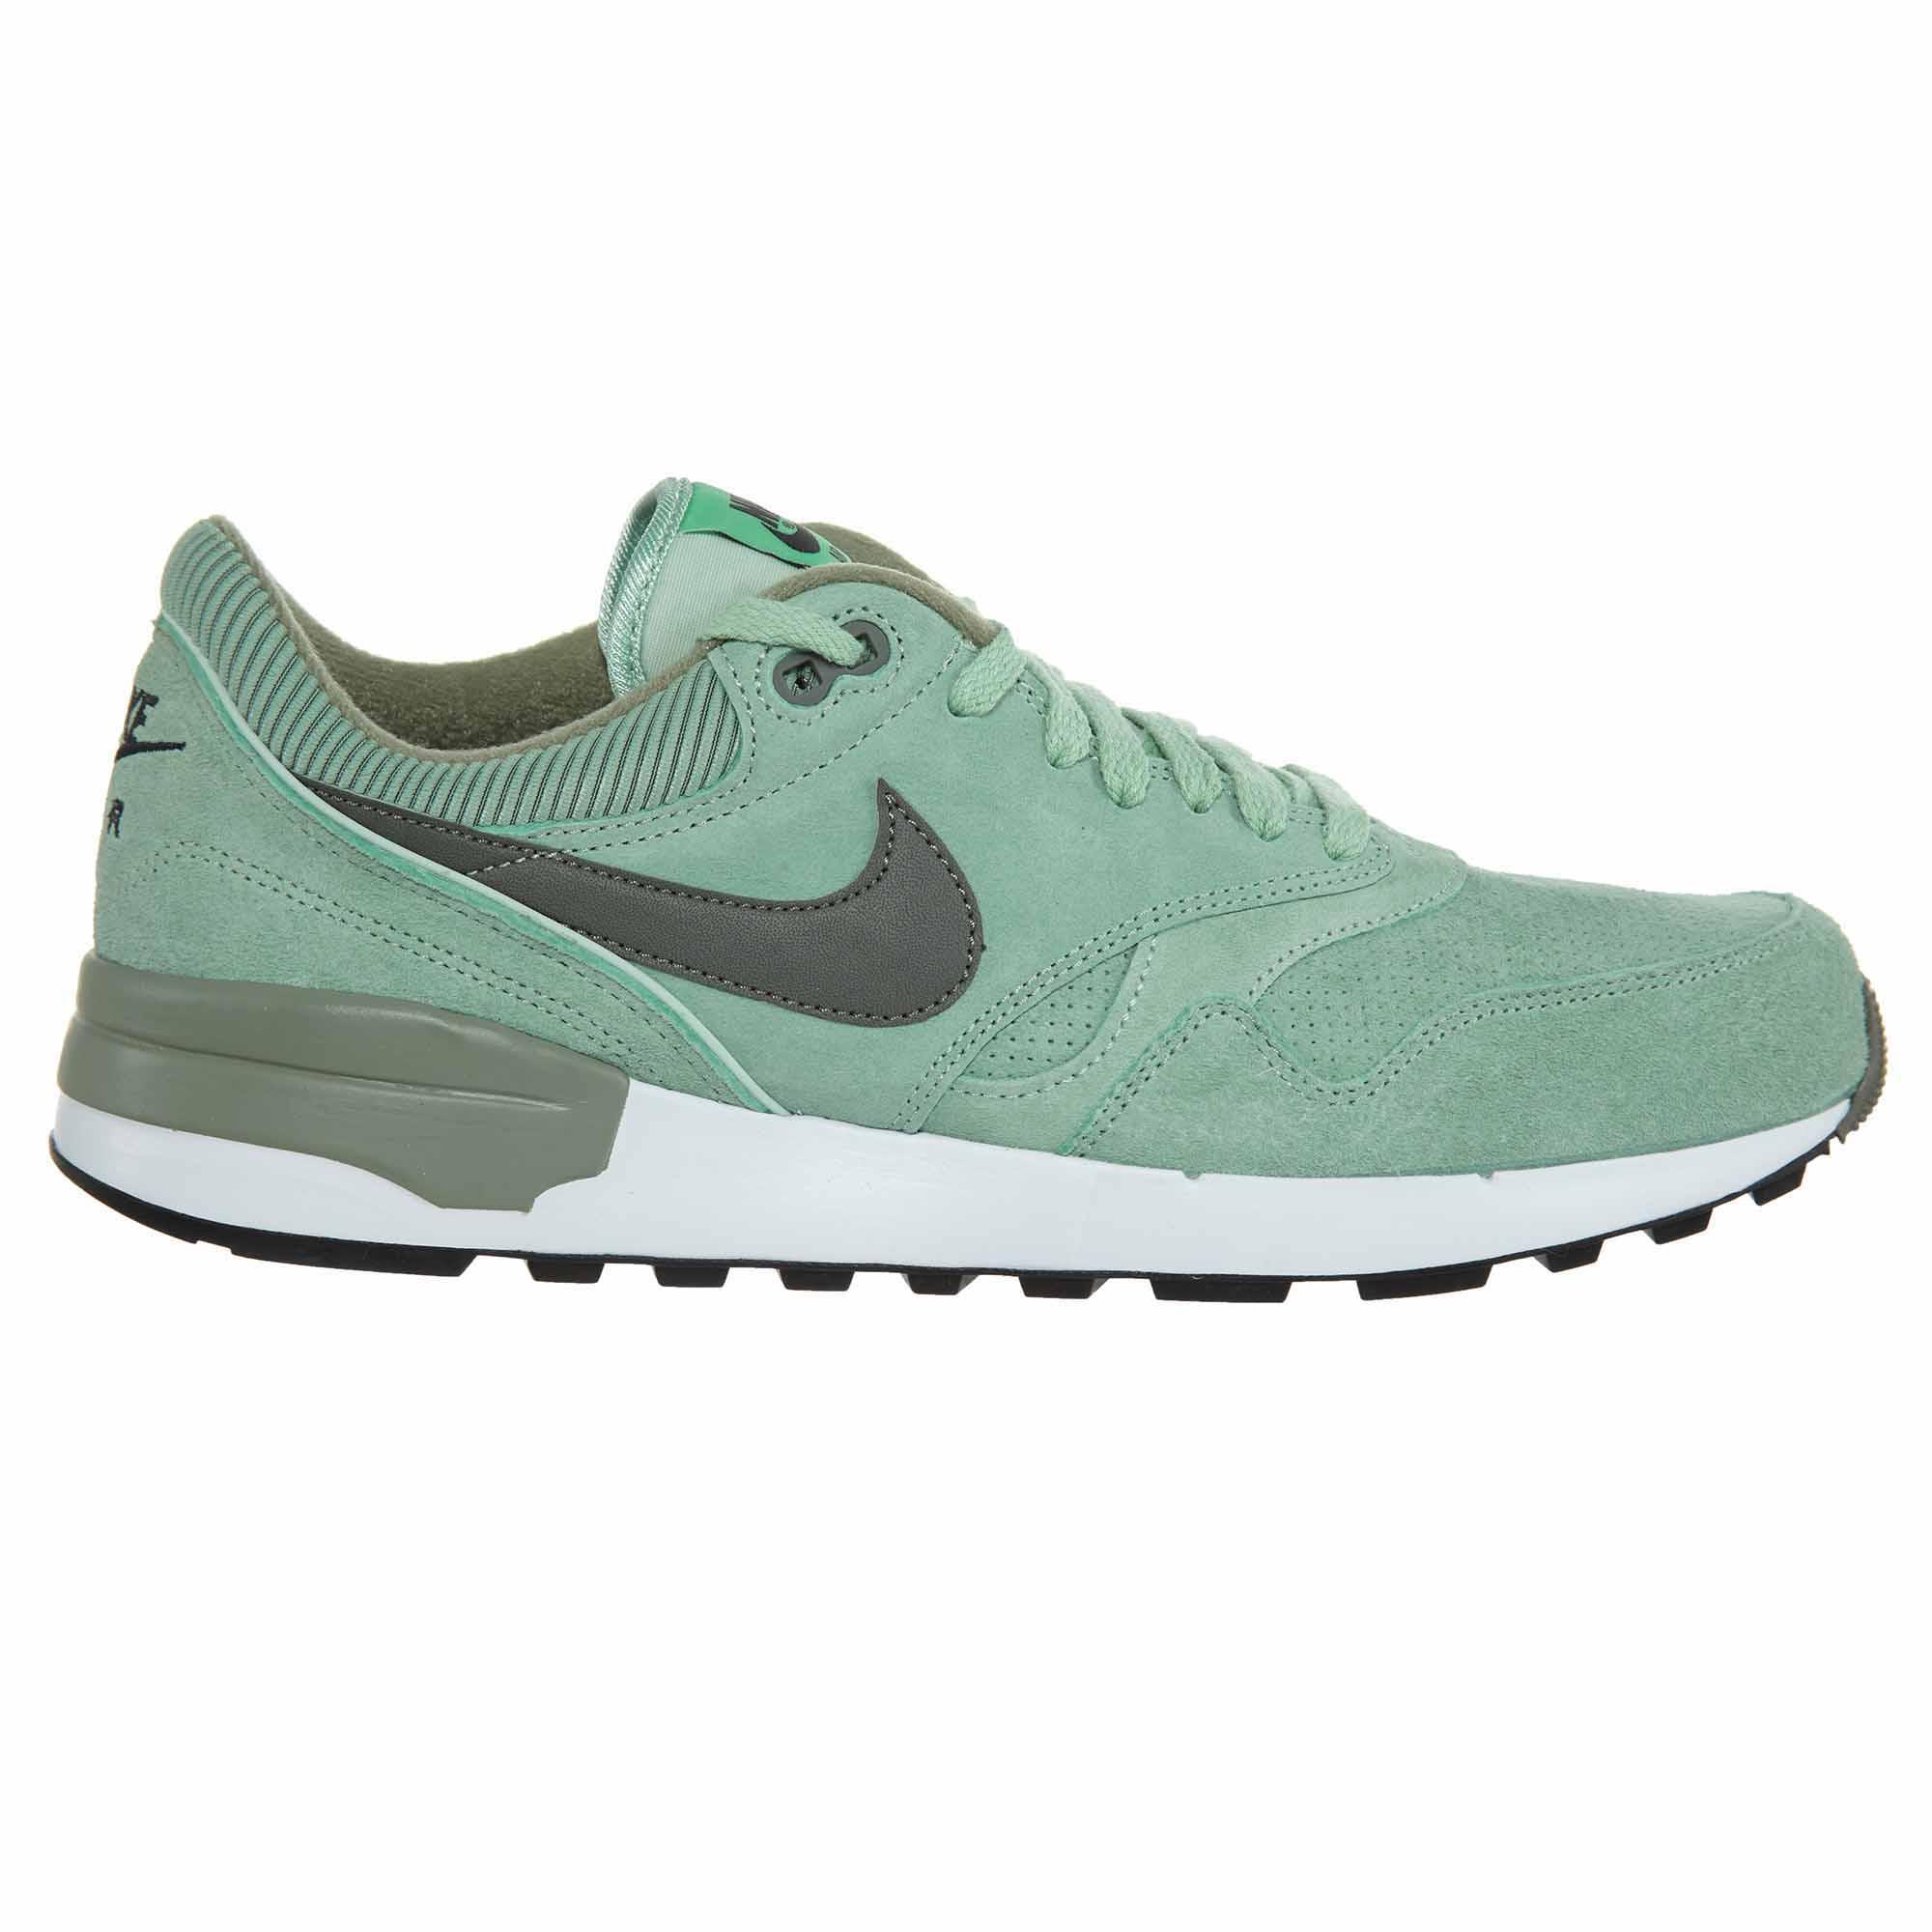 Nike Air Odyssey Ltr Enamel Green/River